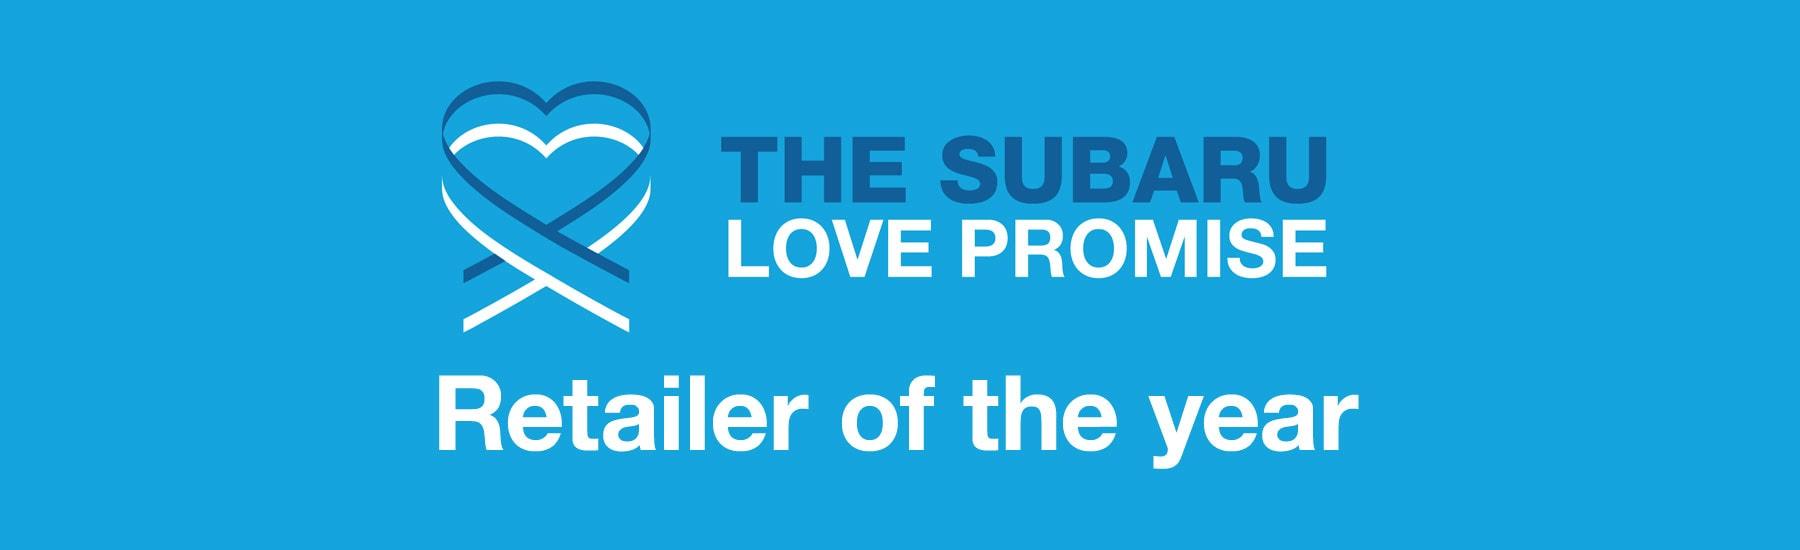 Subaru Love Promise Retailer of the Year